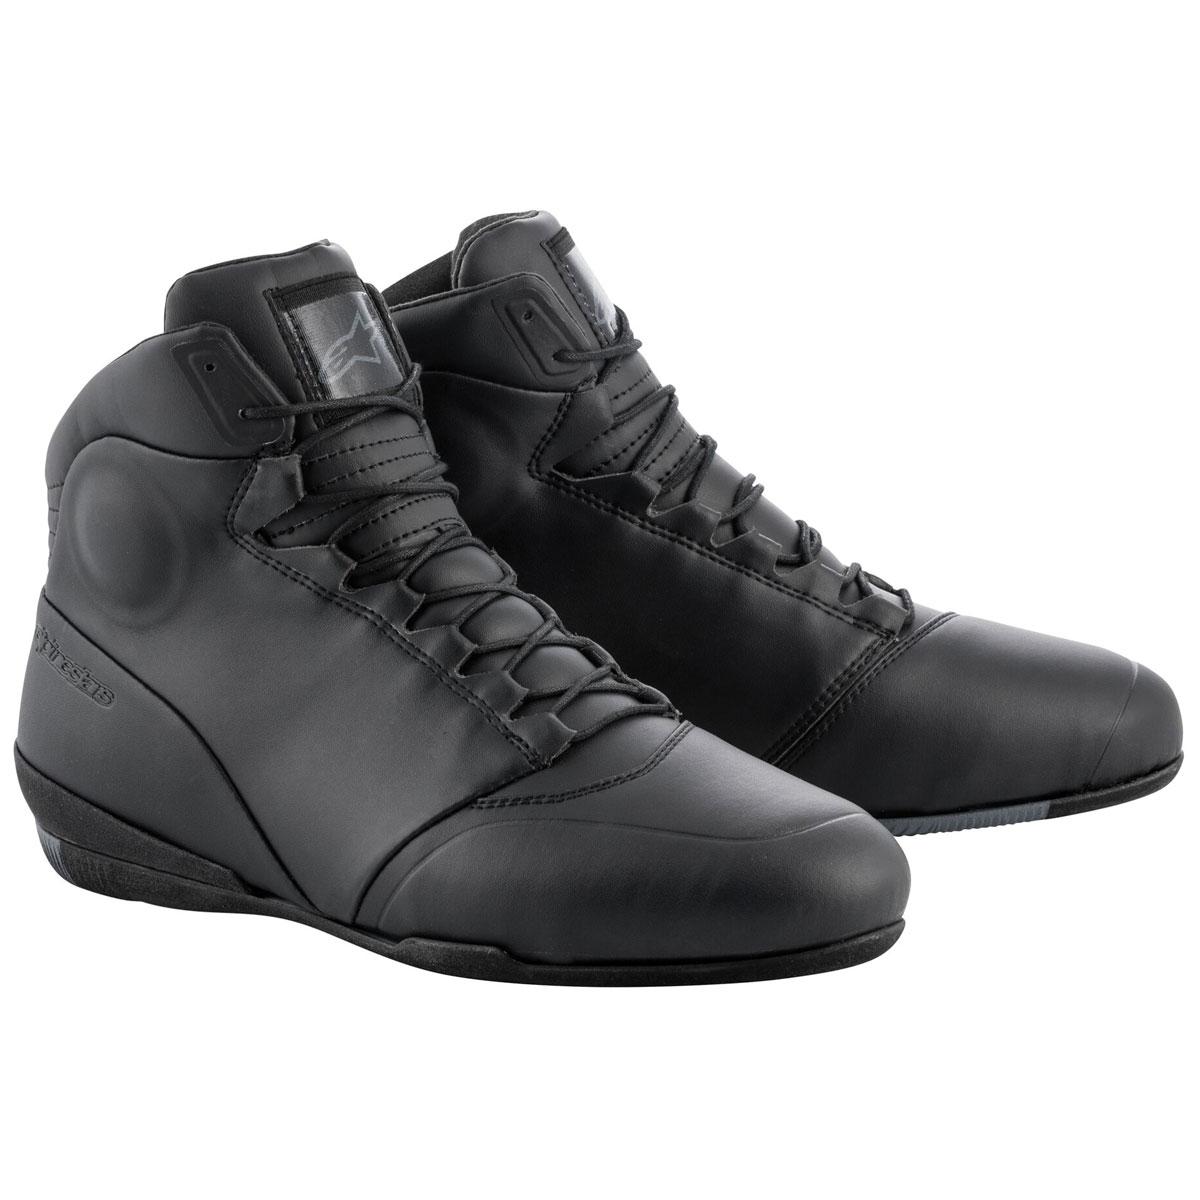 Alpinestars Men's Centre Black Boots